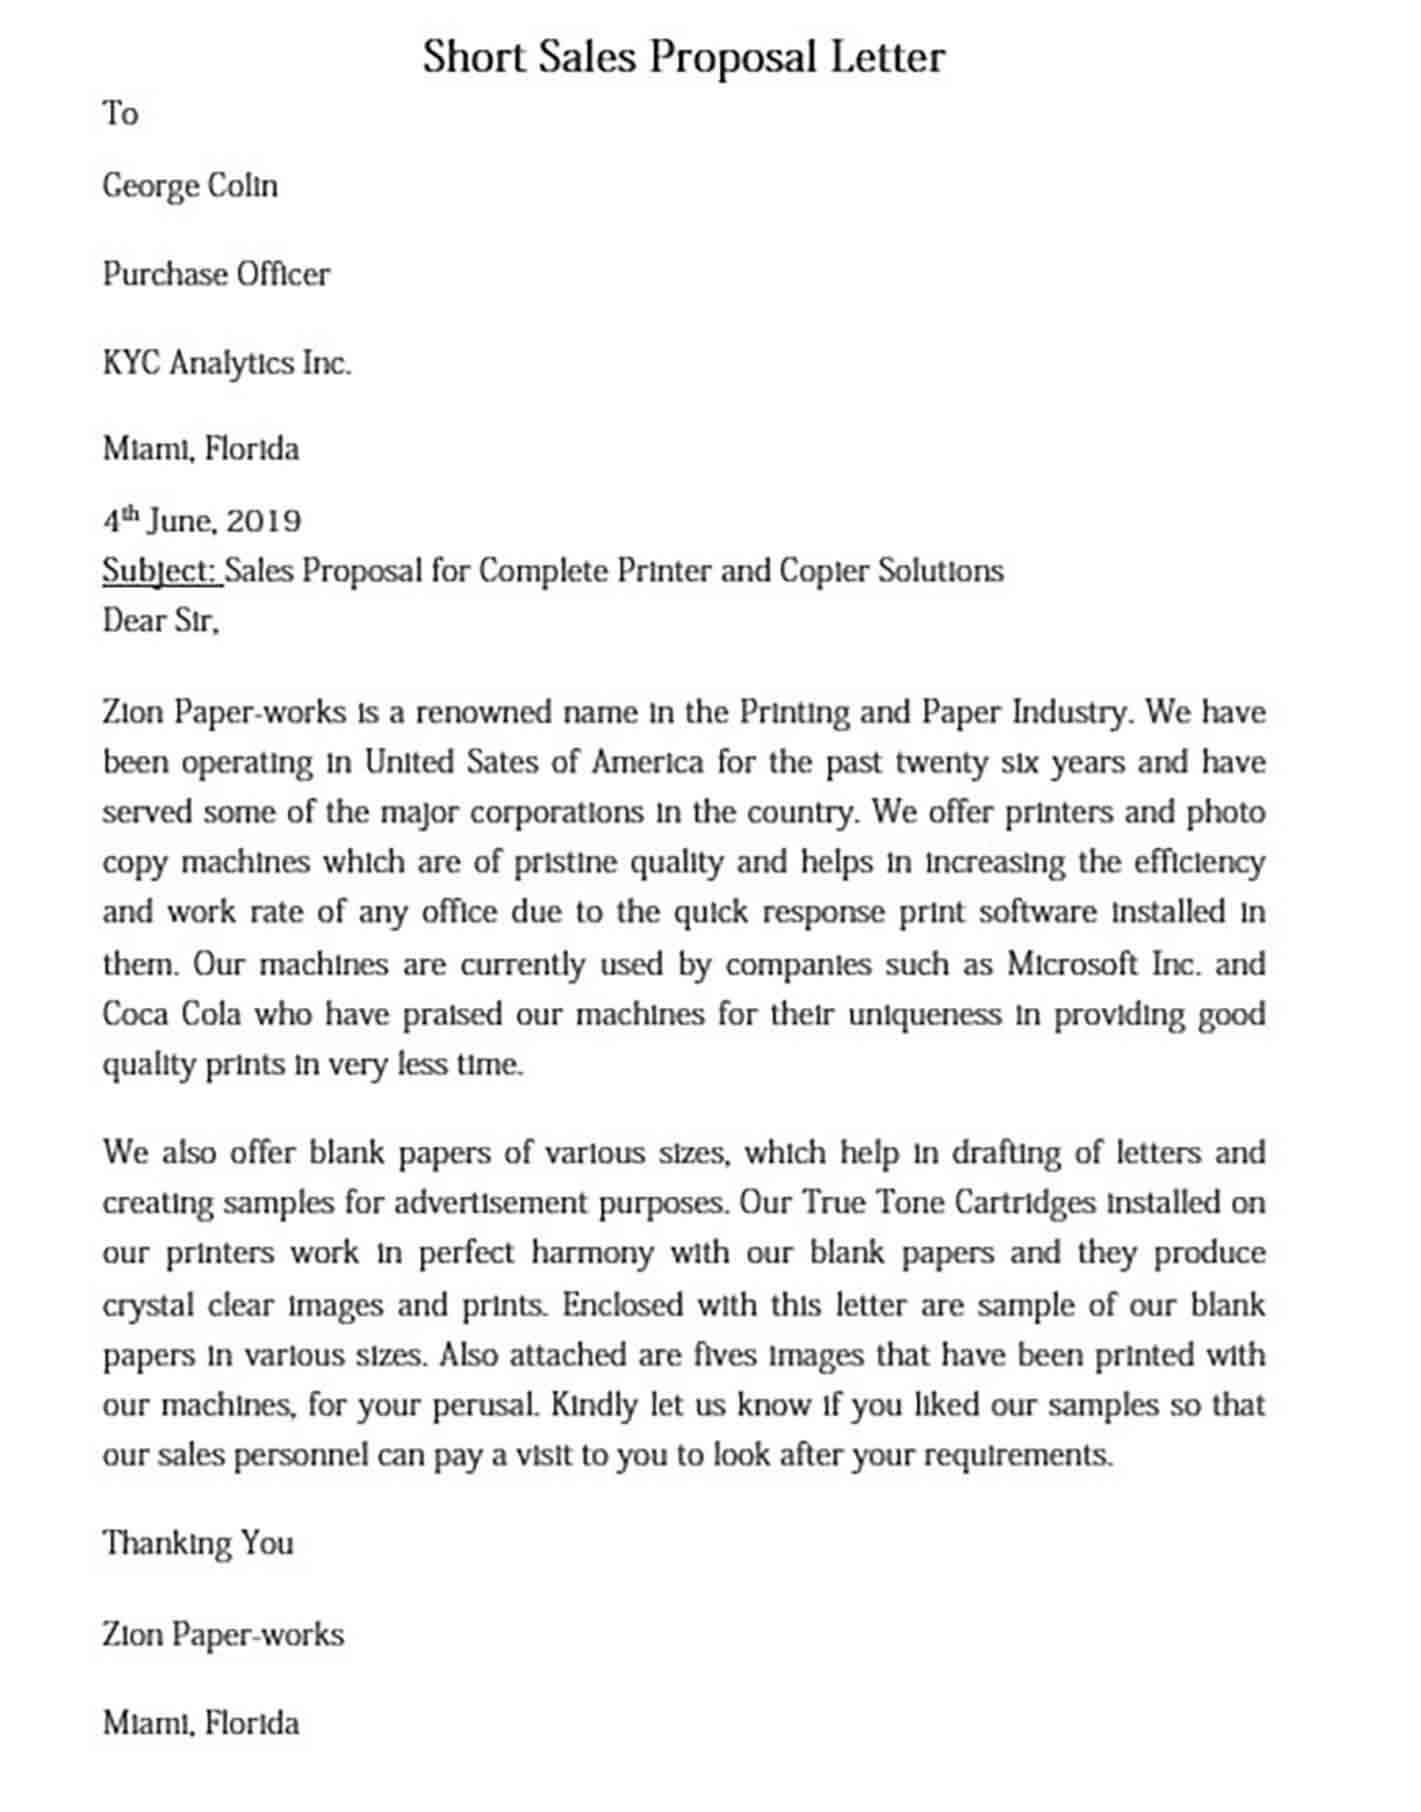 Short Sales Proposal Letter